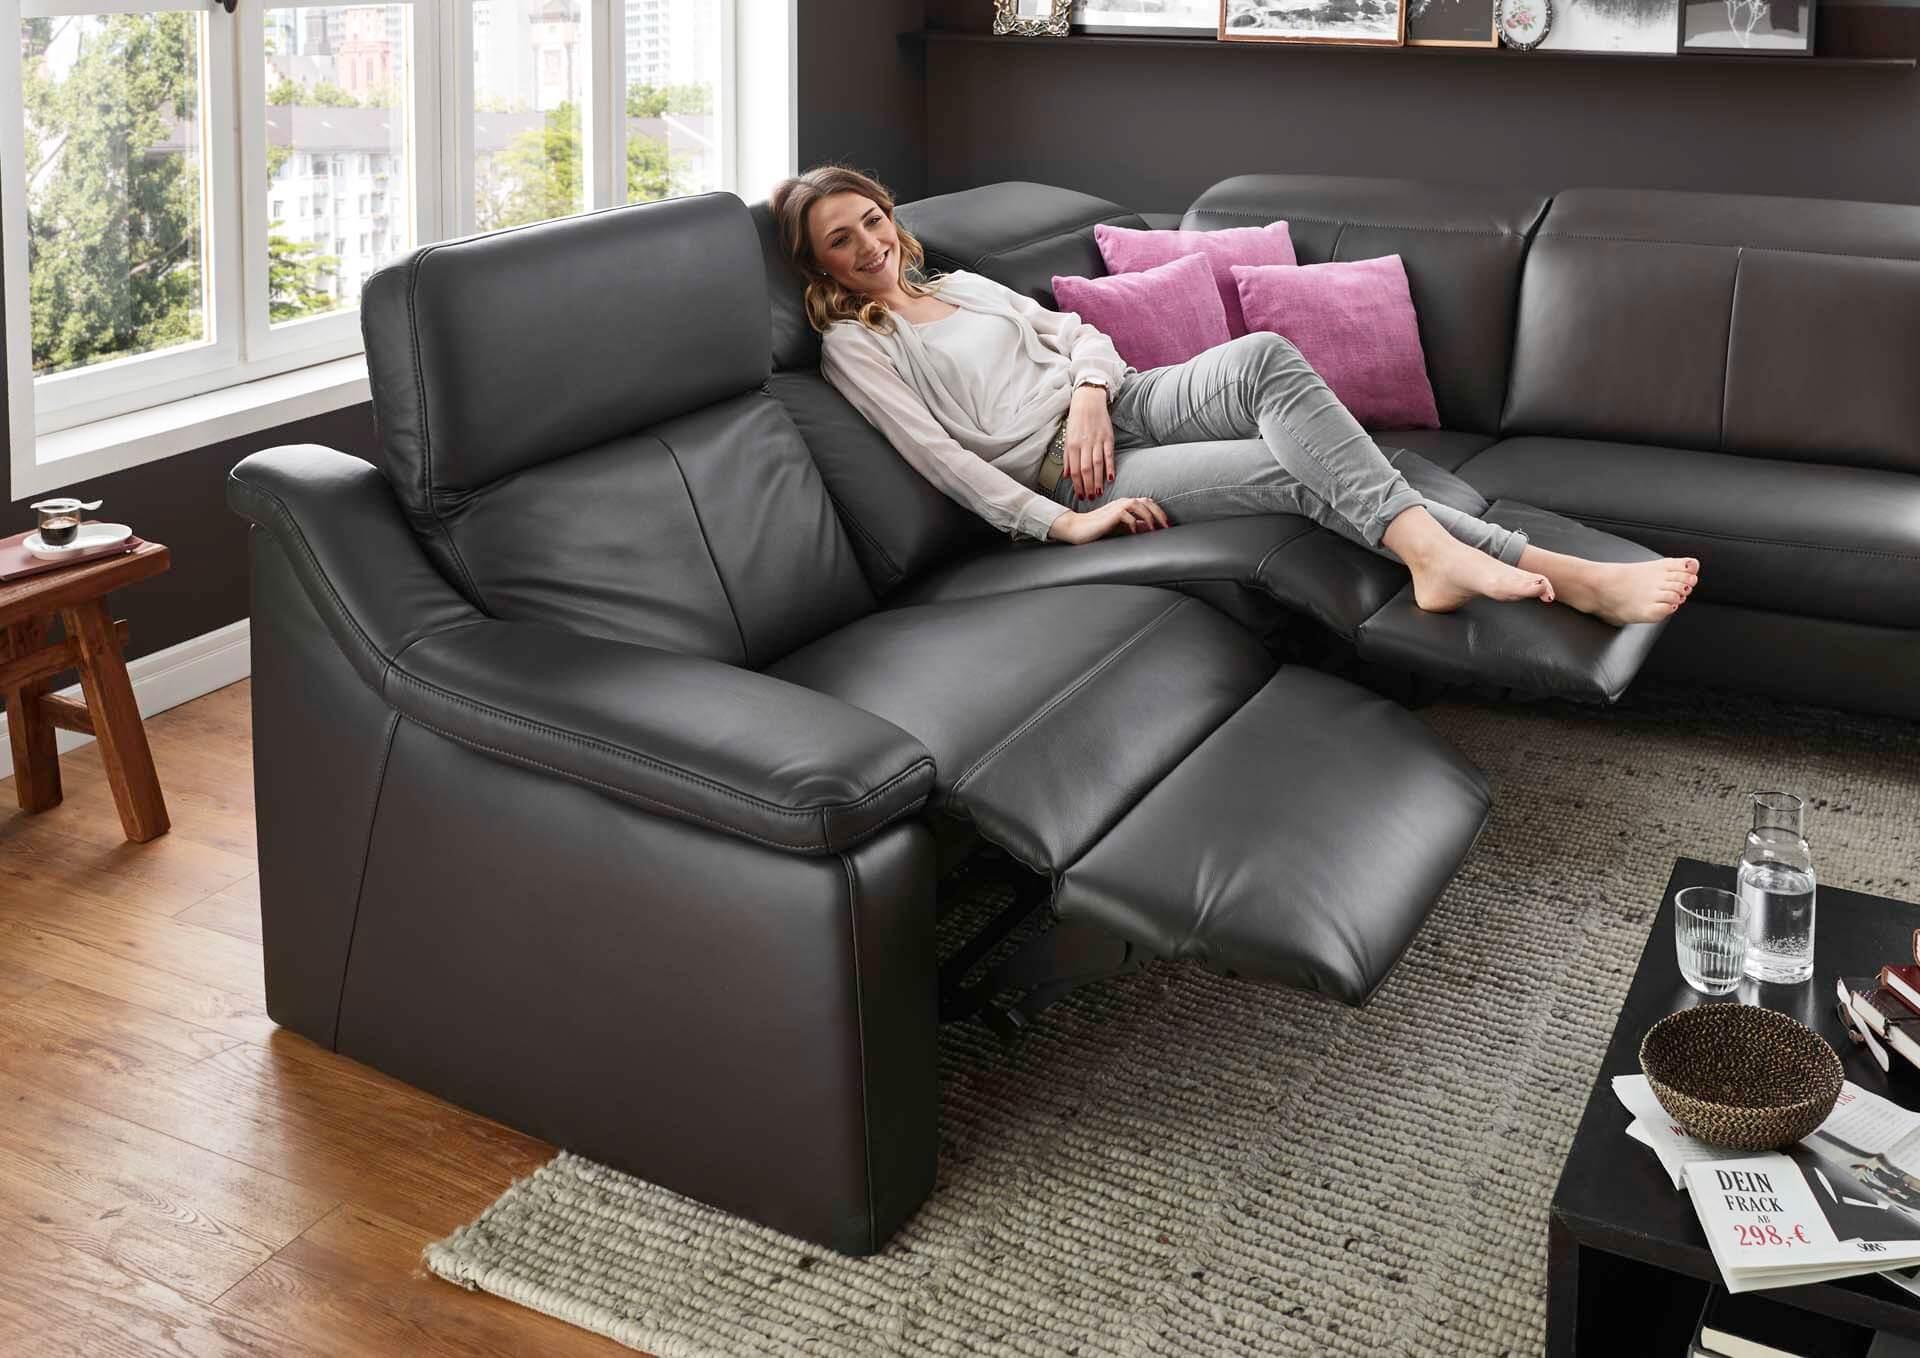 Sofa-Harlem-Com4Lux4